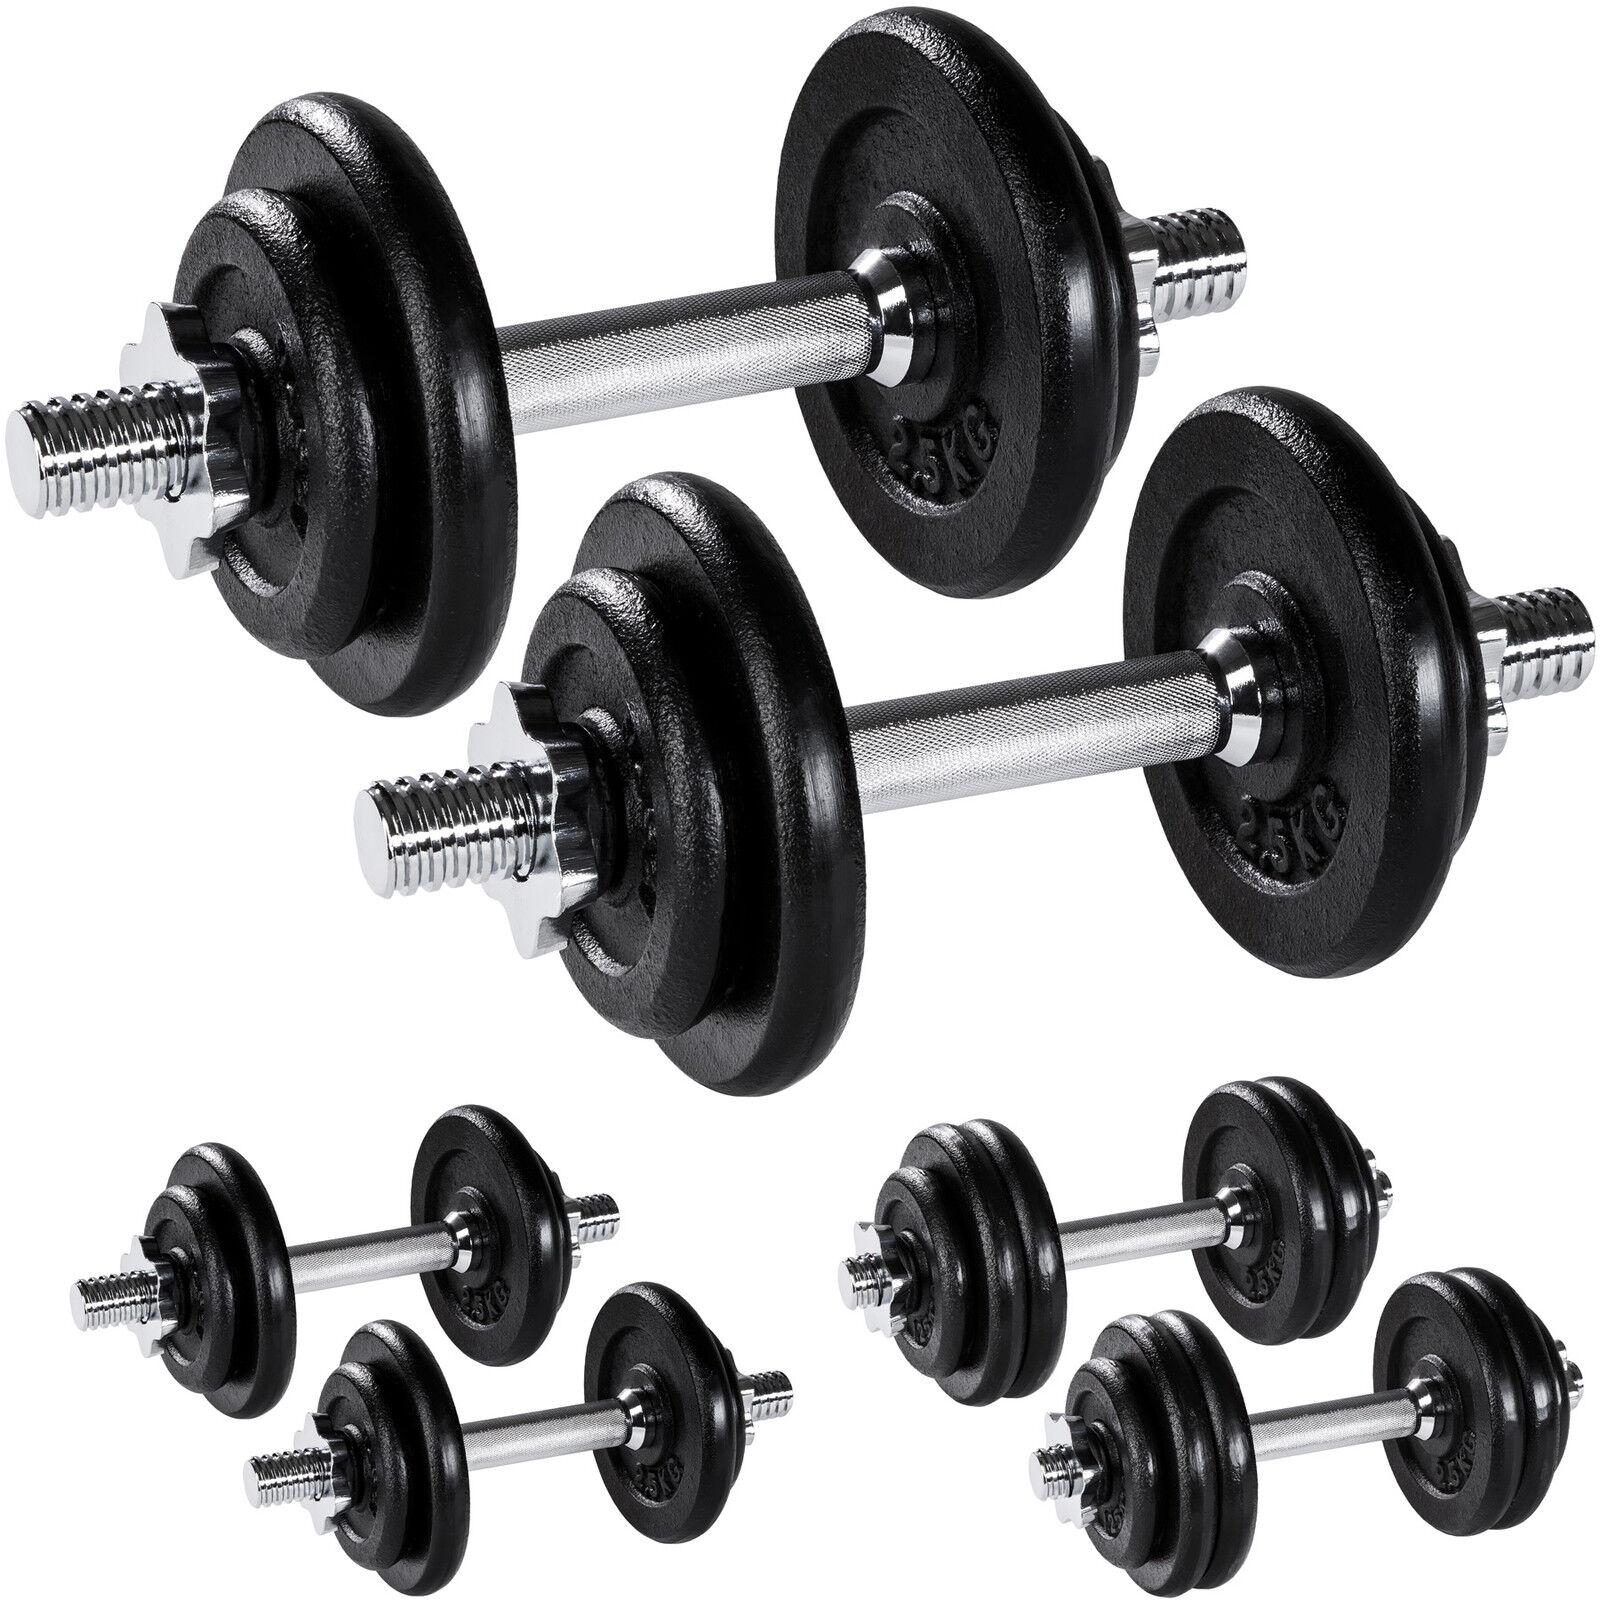 Set d'haltères courts poids barres disques fitness musculation biceps exercice